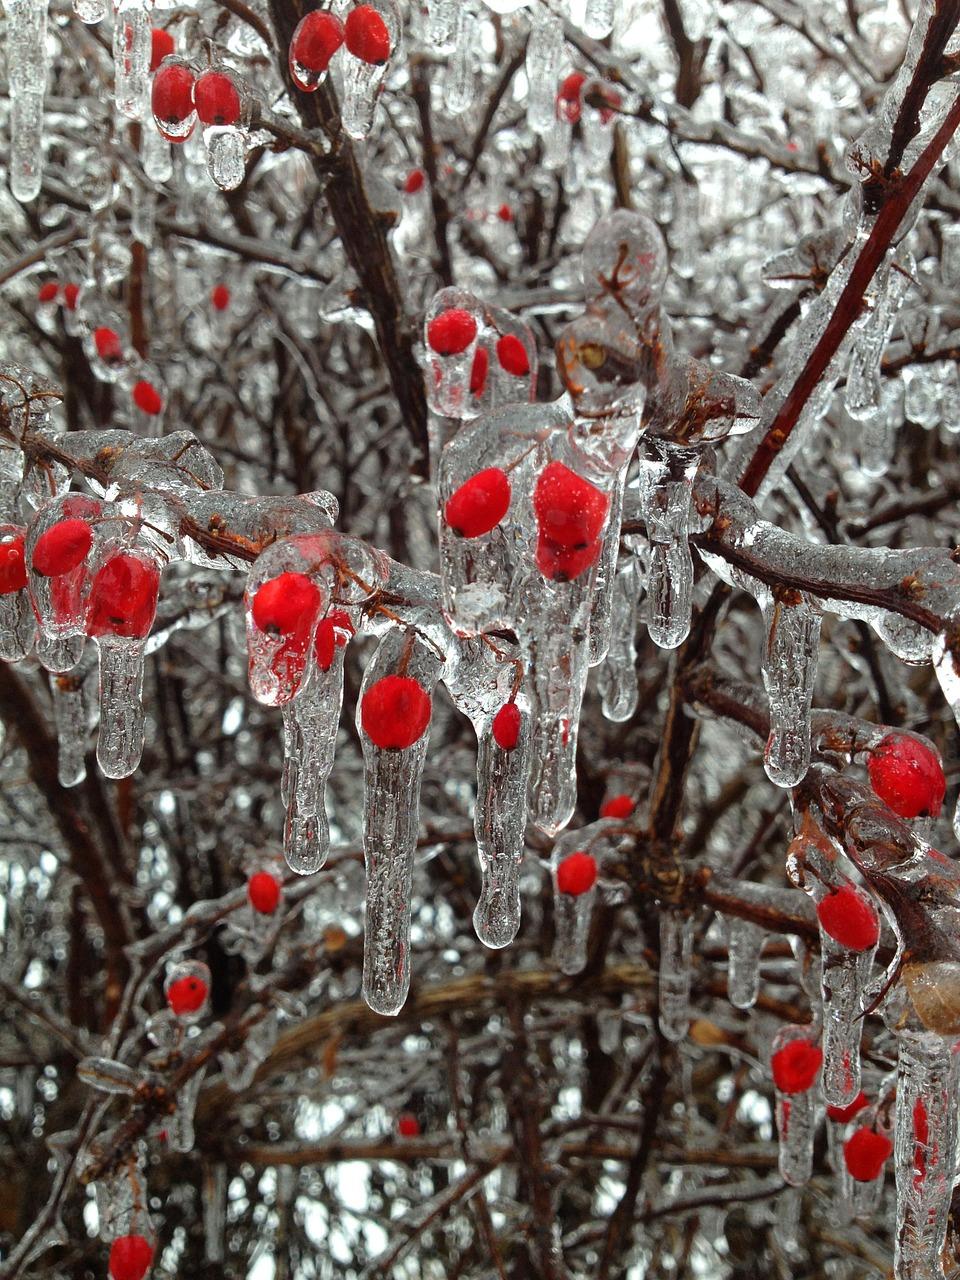 frost can impact biennial bearing